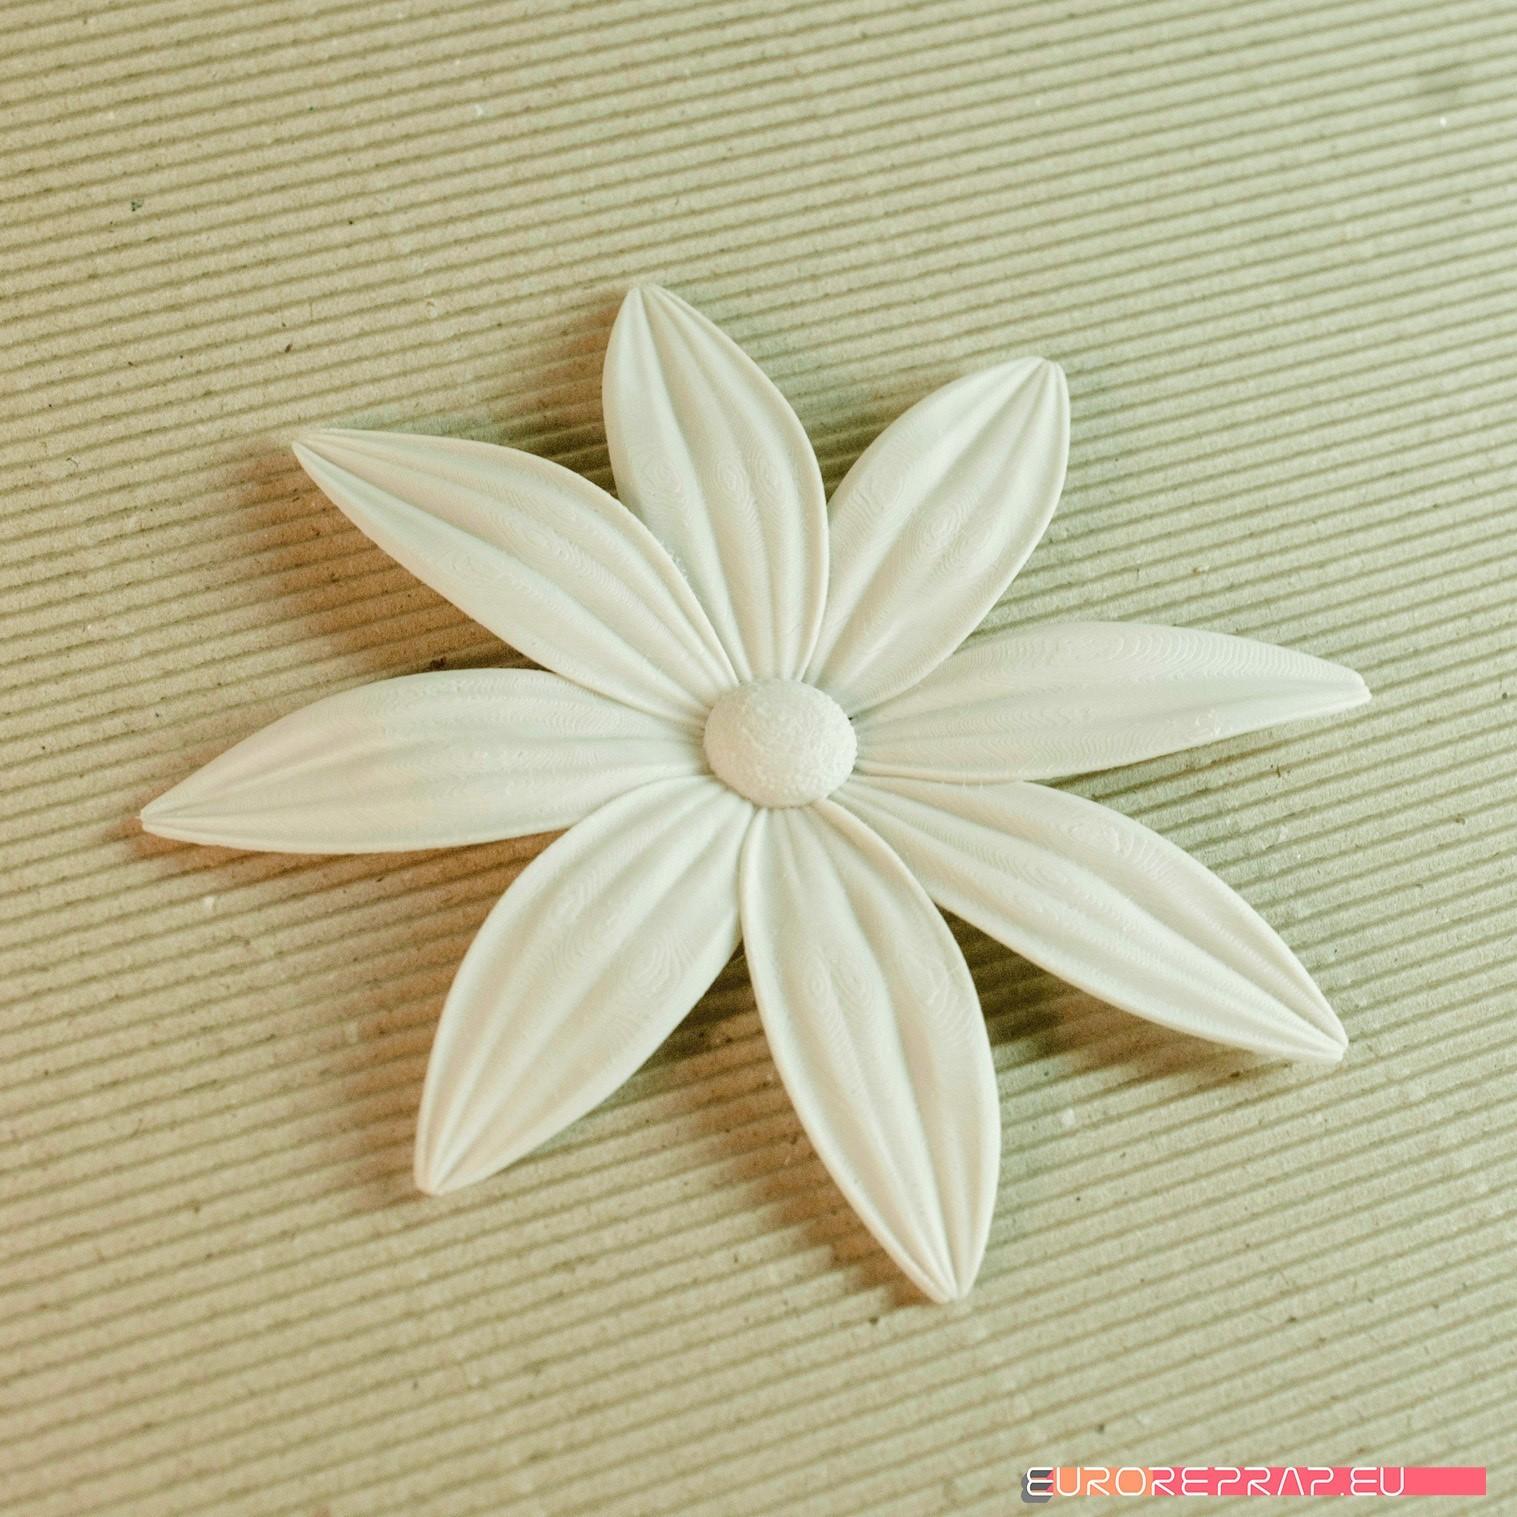 02b.jpg Download STL file flowers: Aster - 3D printable model • 3D printable template, euroreprap_eu